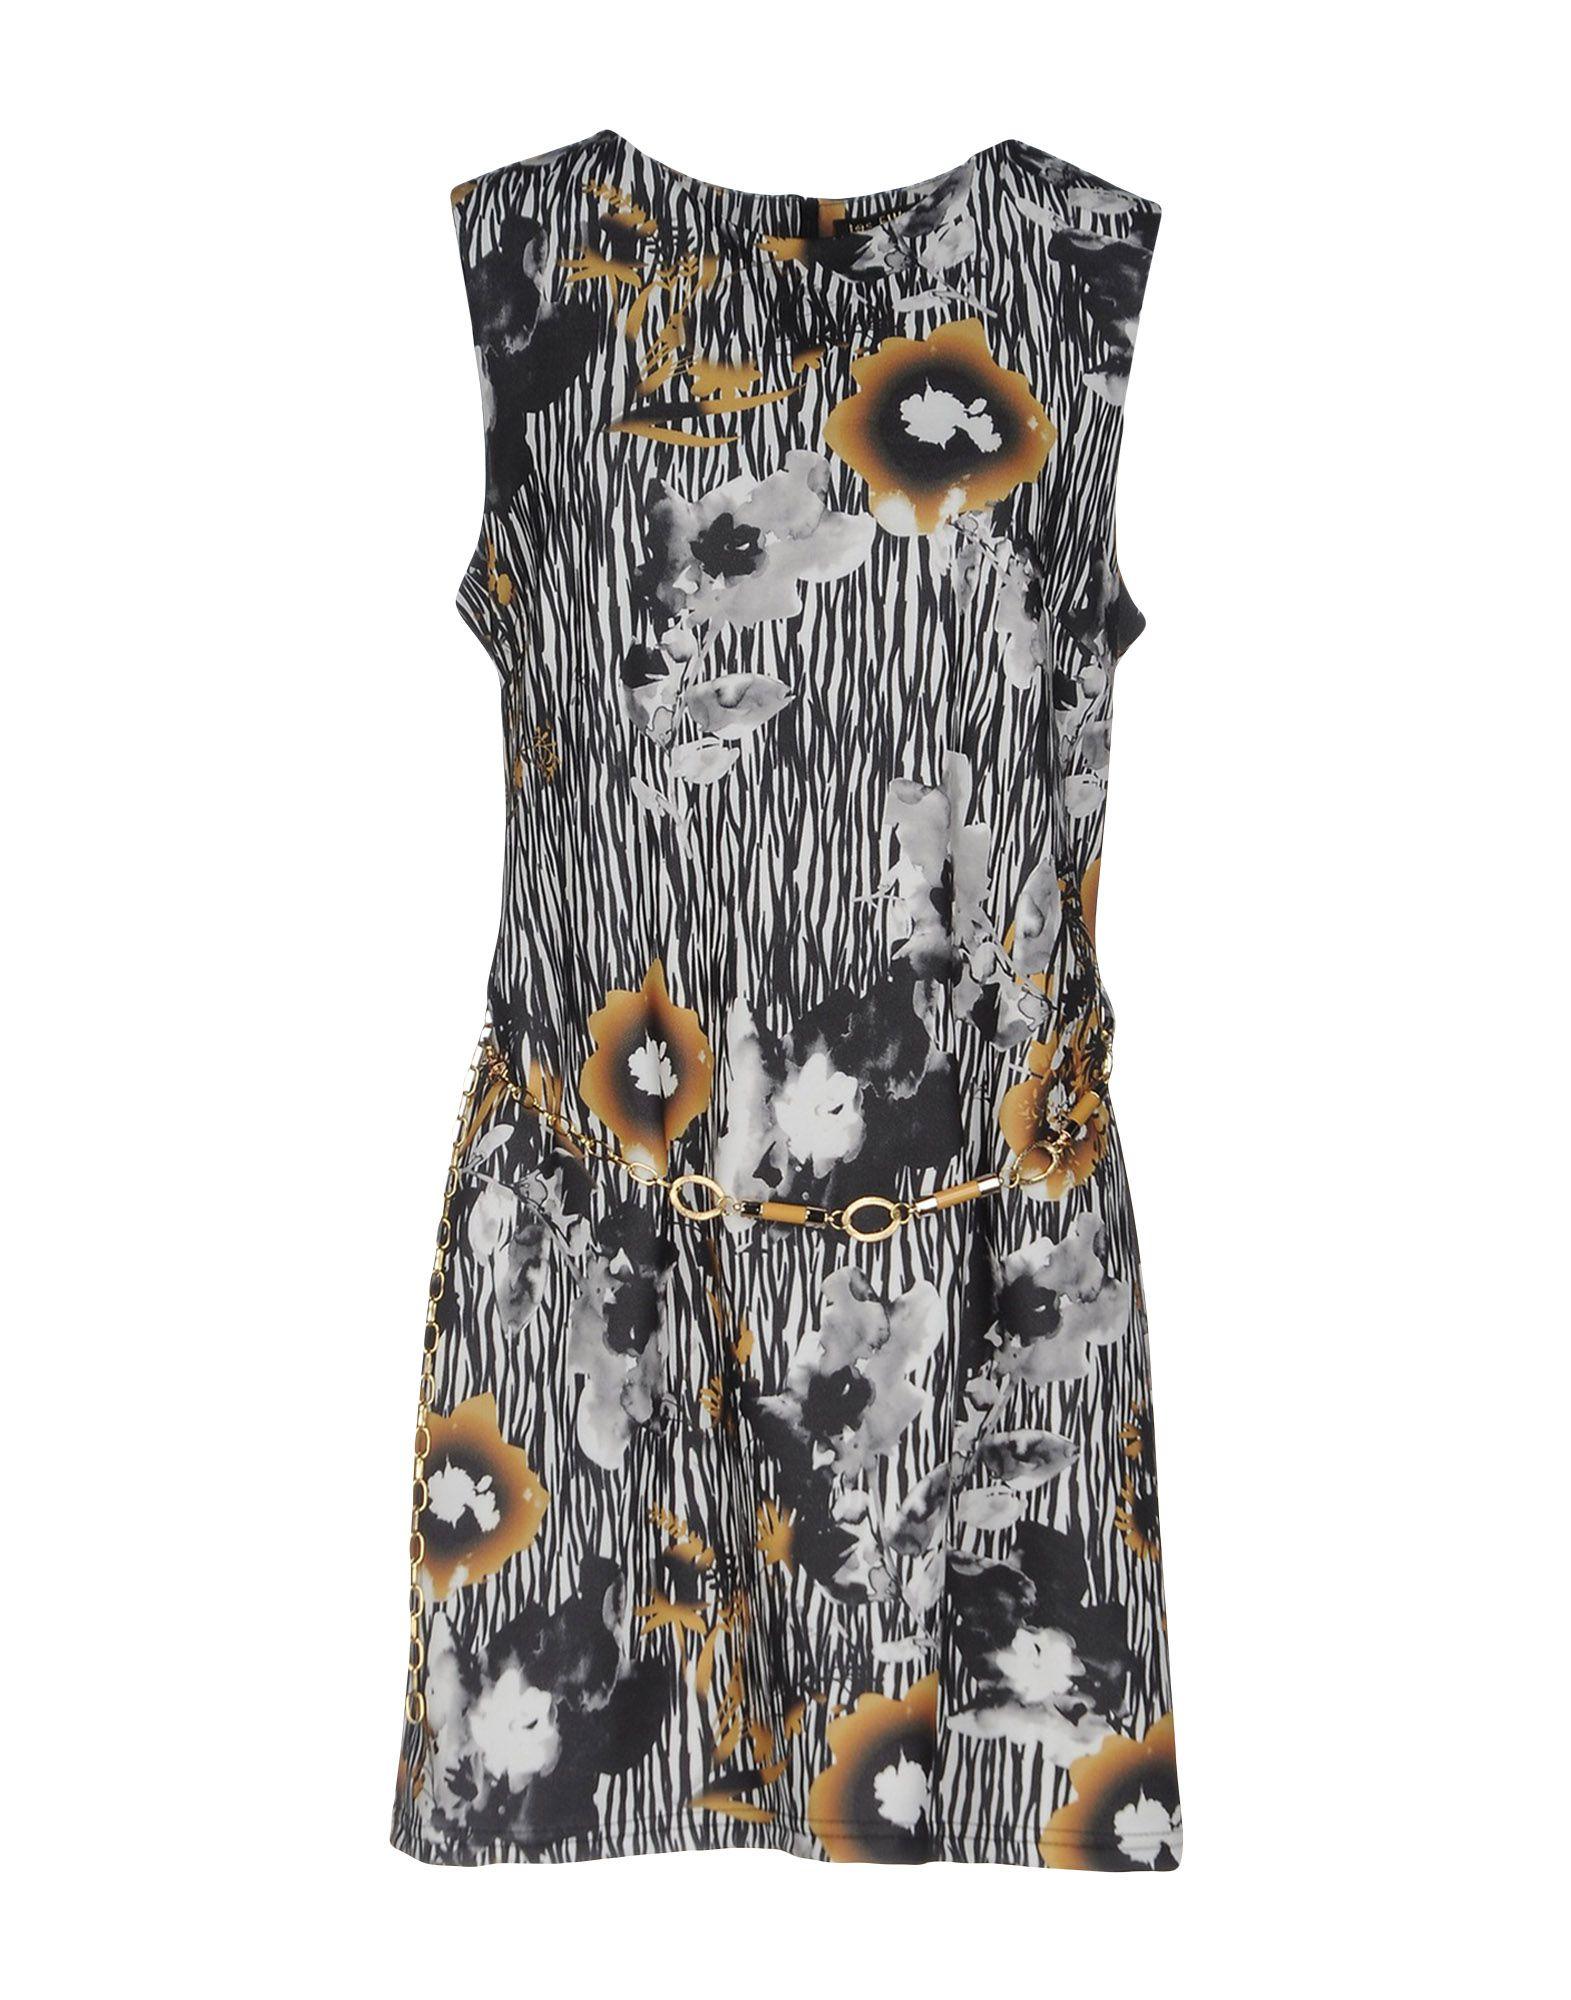 LES FILLES Damen Kurzes Kleid Farbe Schwarz Größe 5